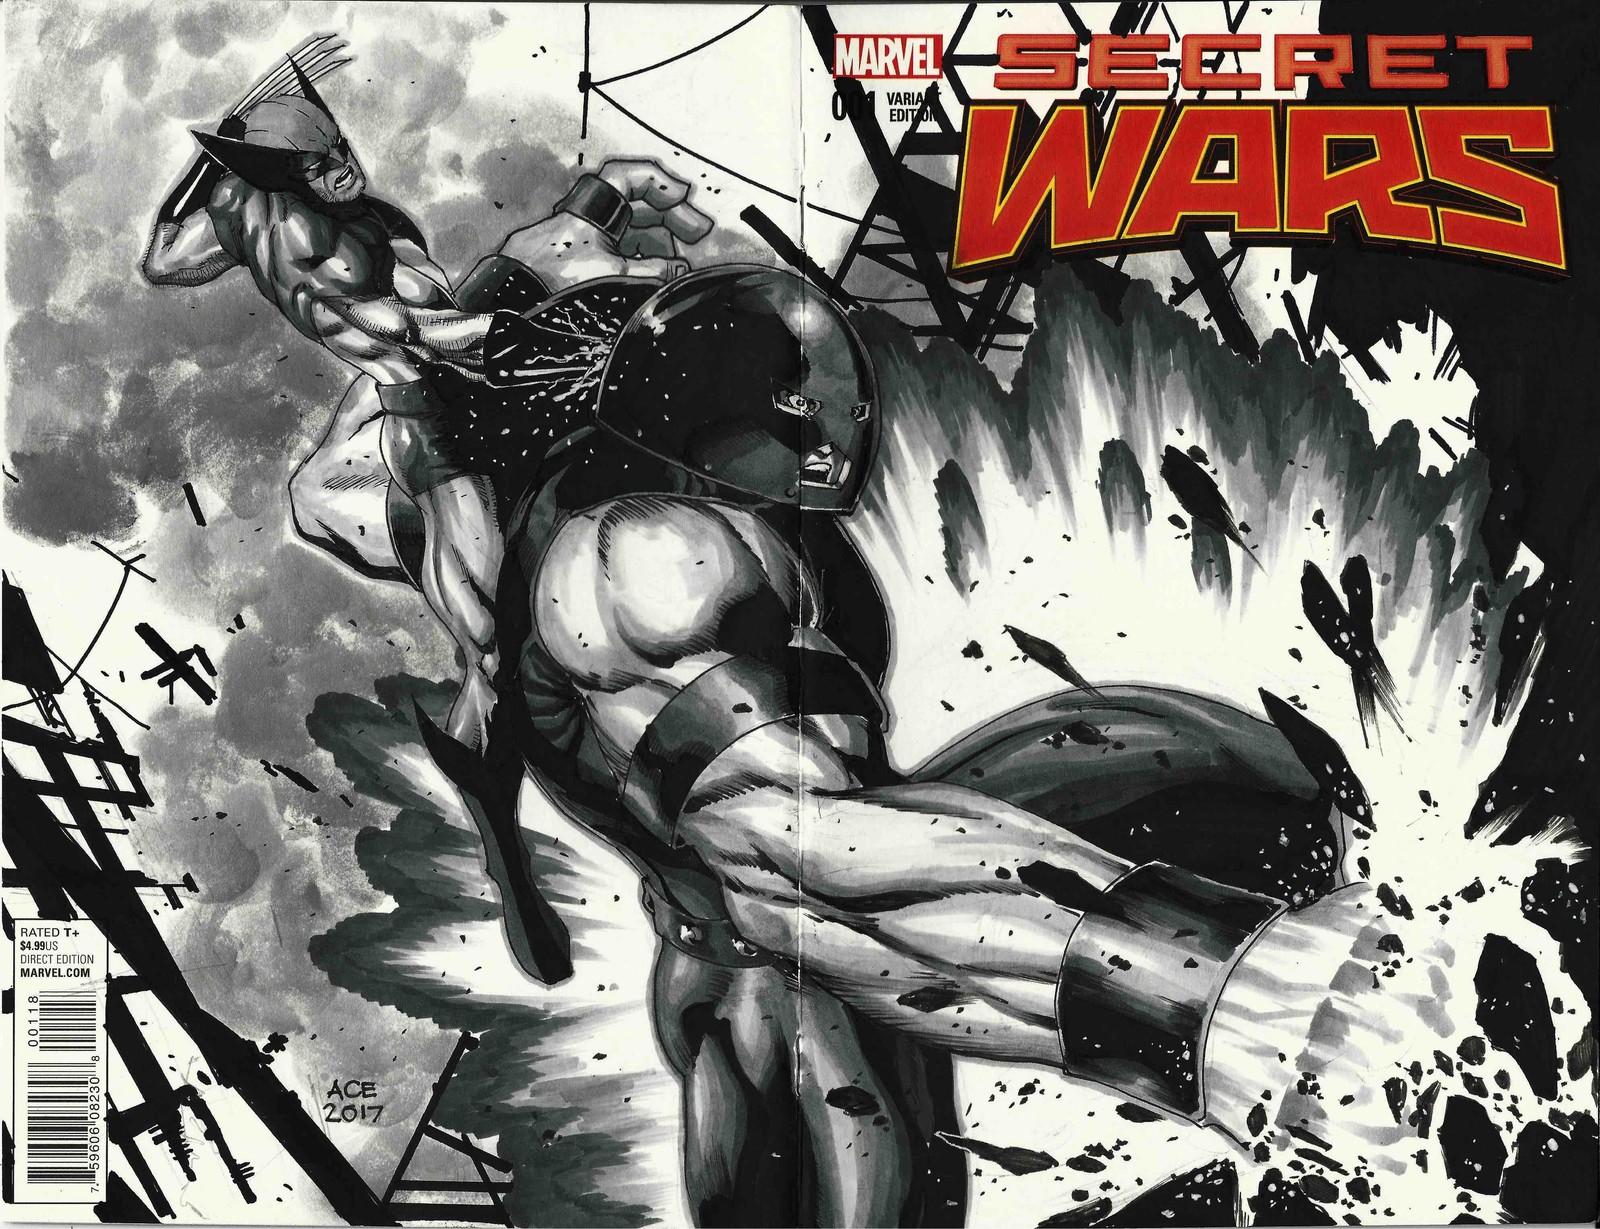 Juggernaut vs Wolverine